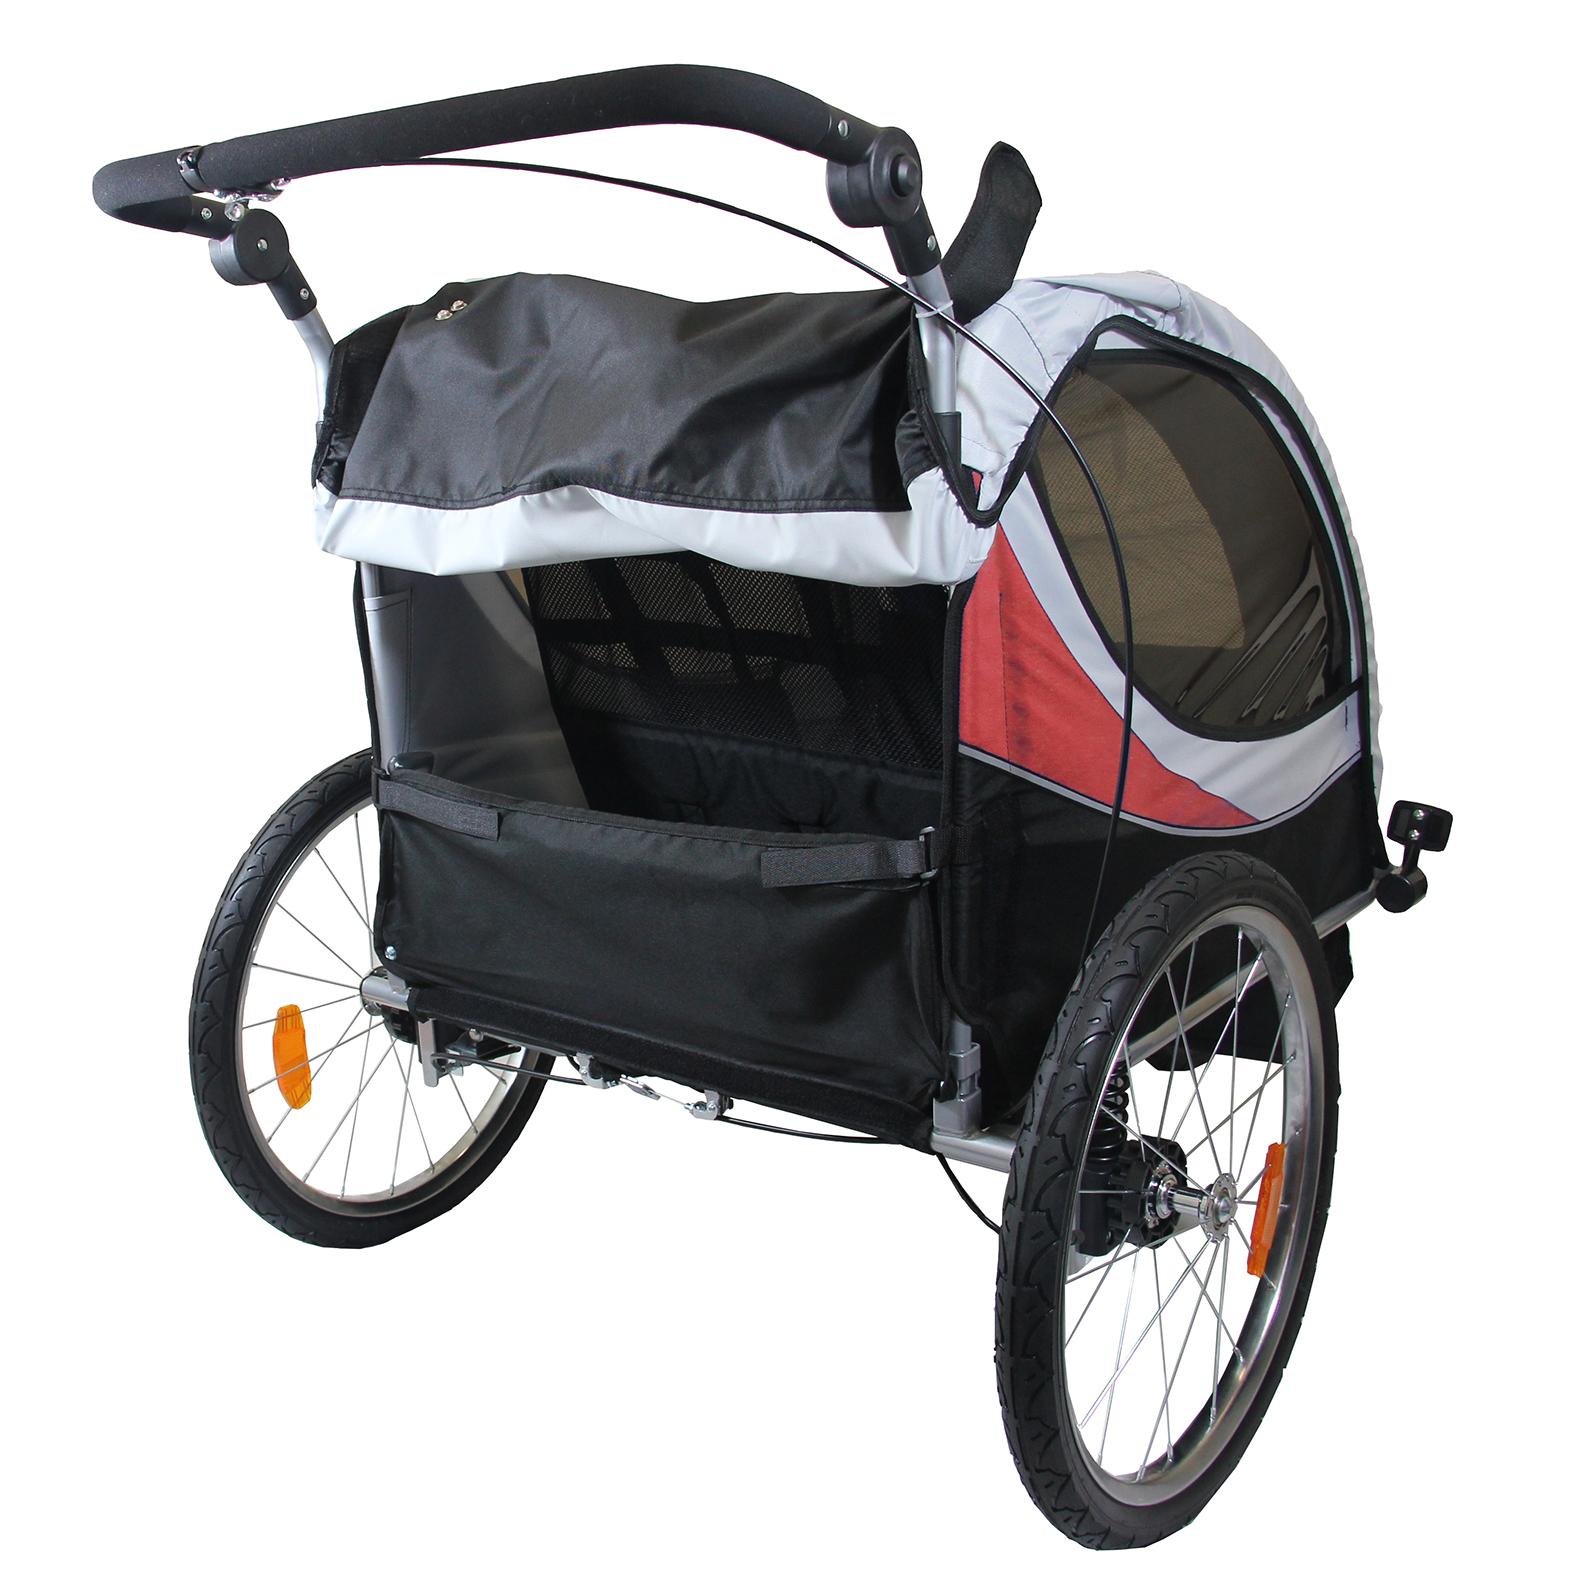 Clevr 2 Seat 3 In 1 Kids Child Stroller Jogger Bike